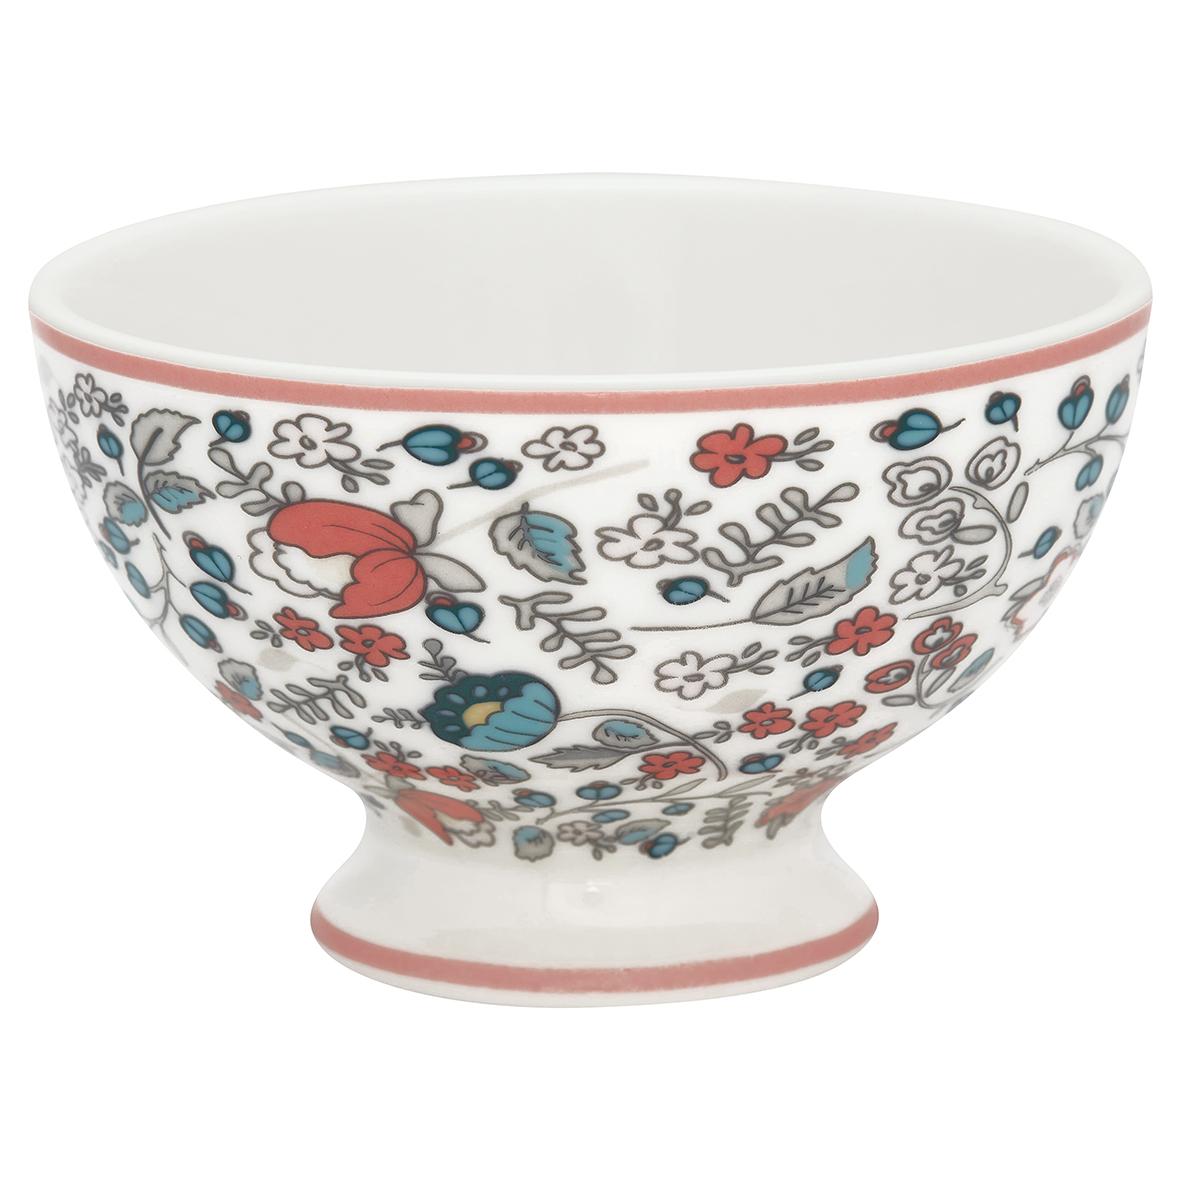 Müslischale - Snack bowl - Miley white - Greengate